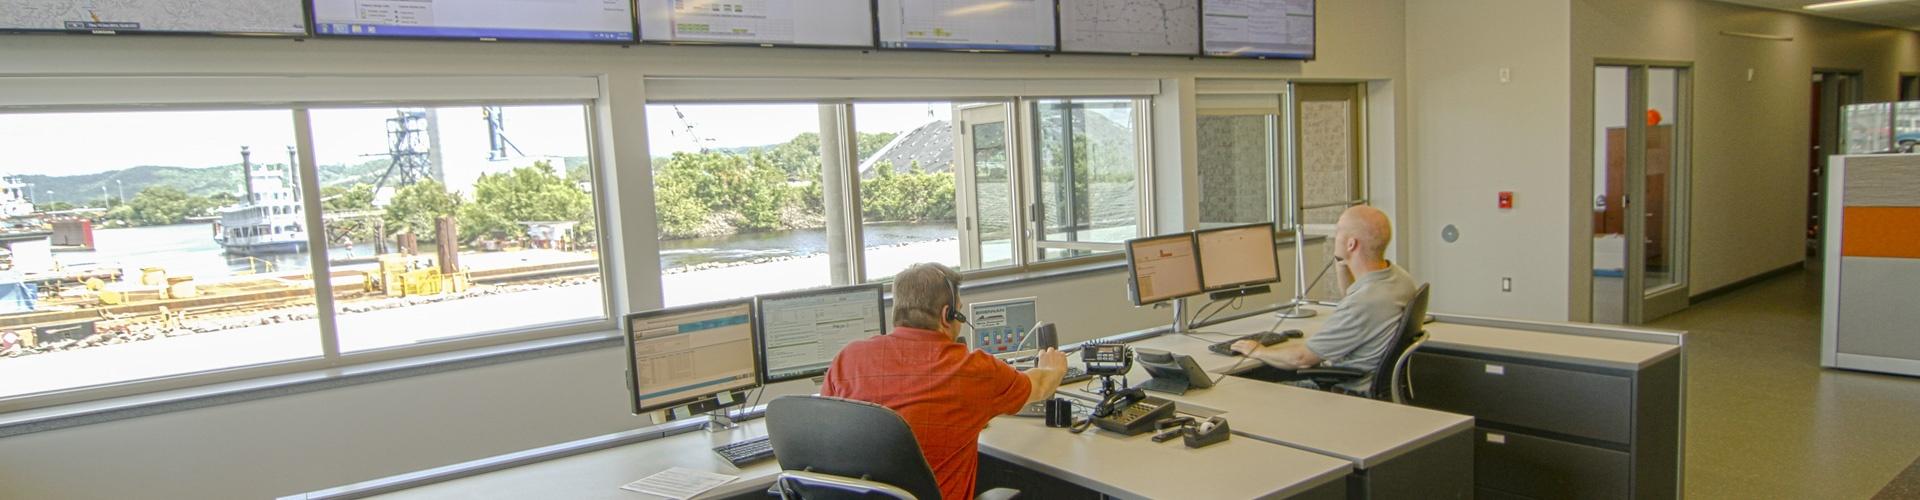 harbor management service, marine assists, towboat assists, lock assists, railroad bridge assists, lock and dam 8 assists, lock and dam 7 assists, barge assists, carrier assists